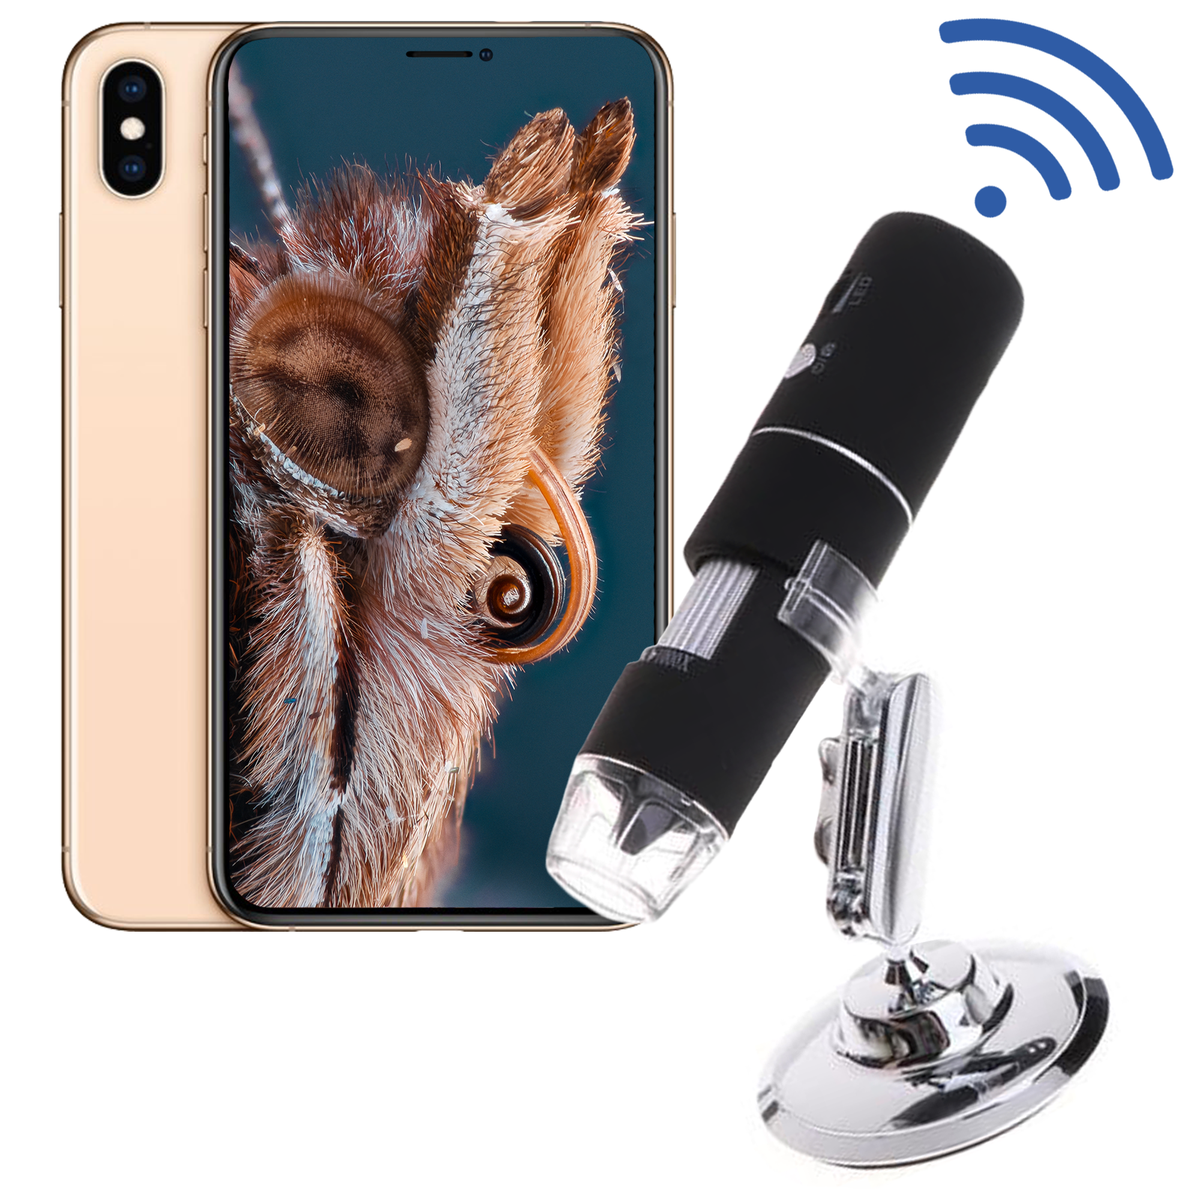 Wireless 1080p Microscope Camera Computer chip, Camera